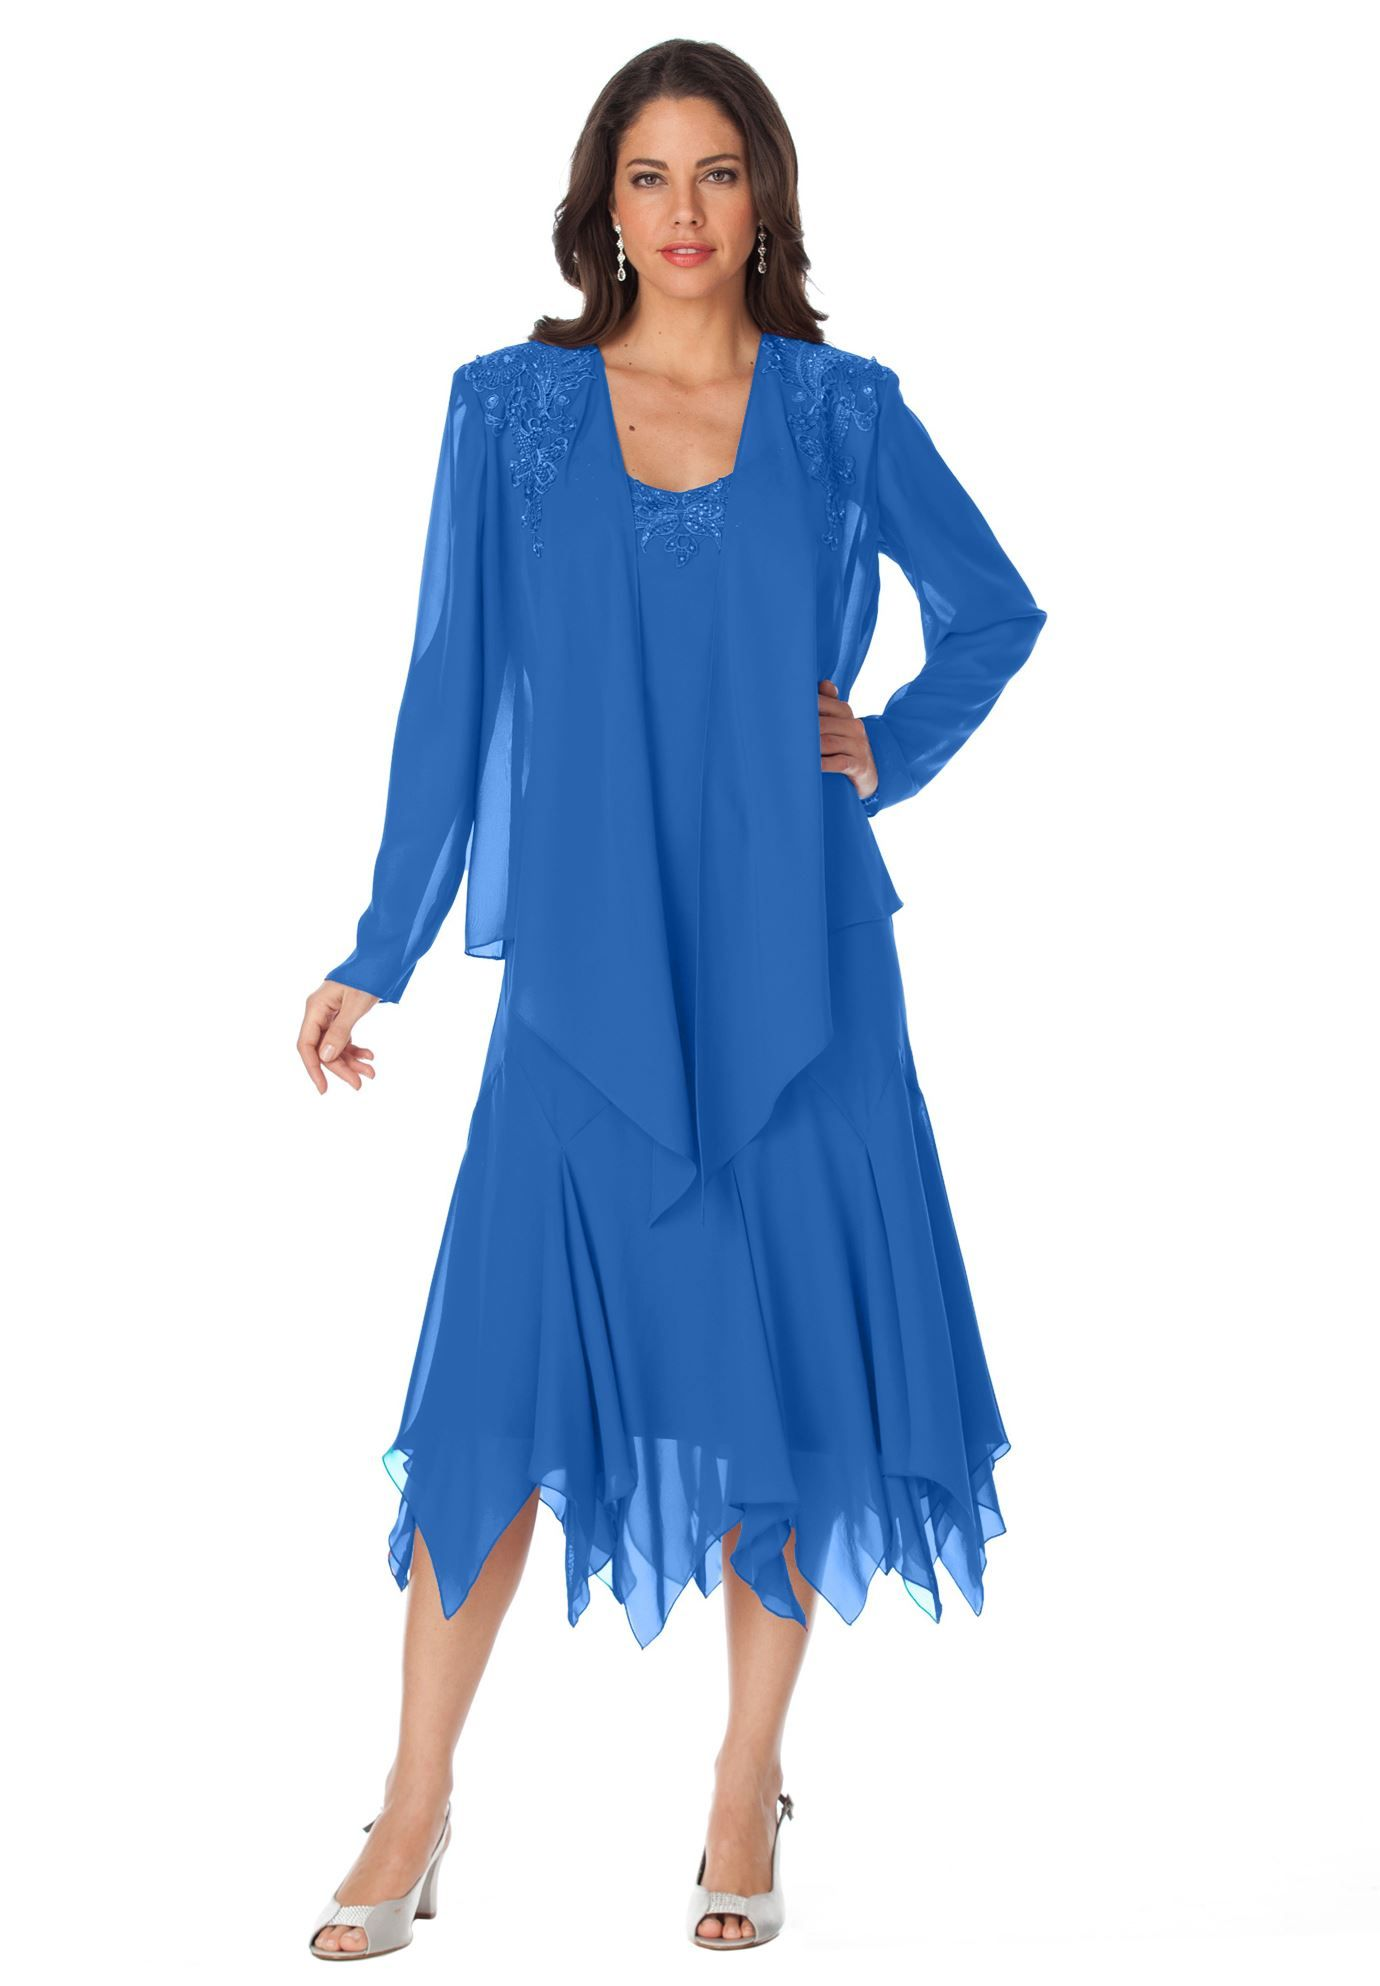 215ff590341 Beaded Hankie Hem Fit   Flare Jacket Dress